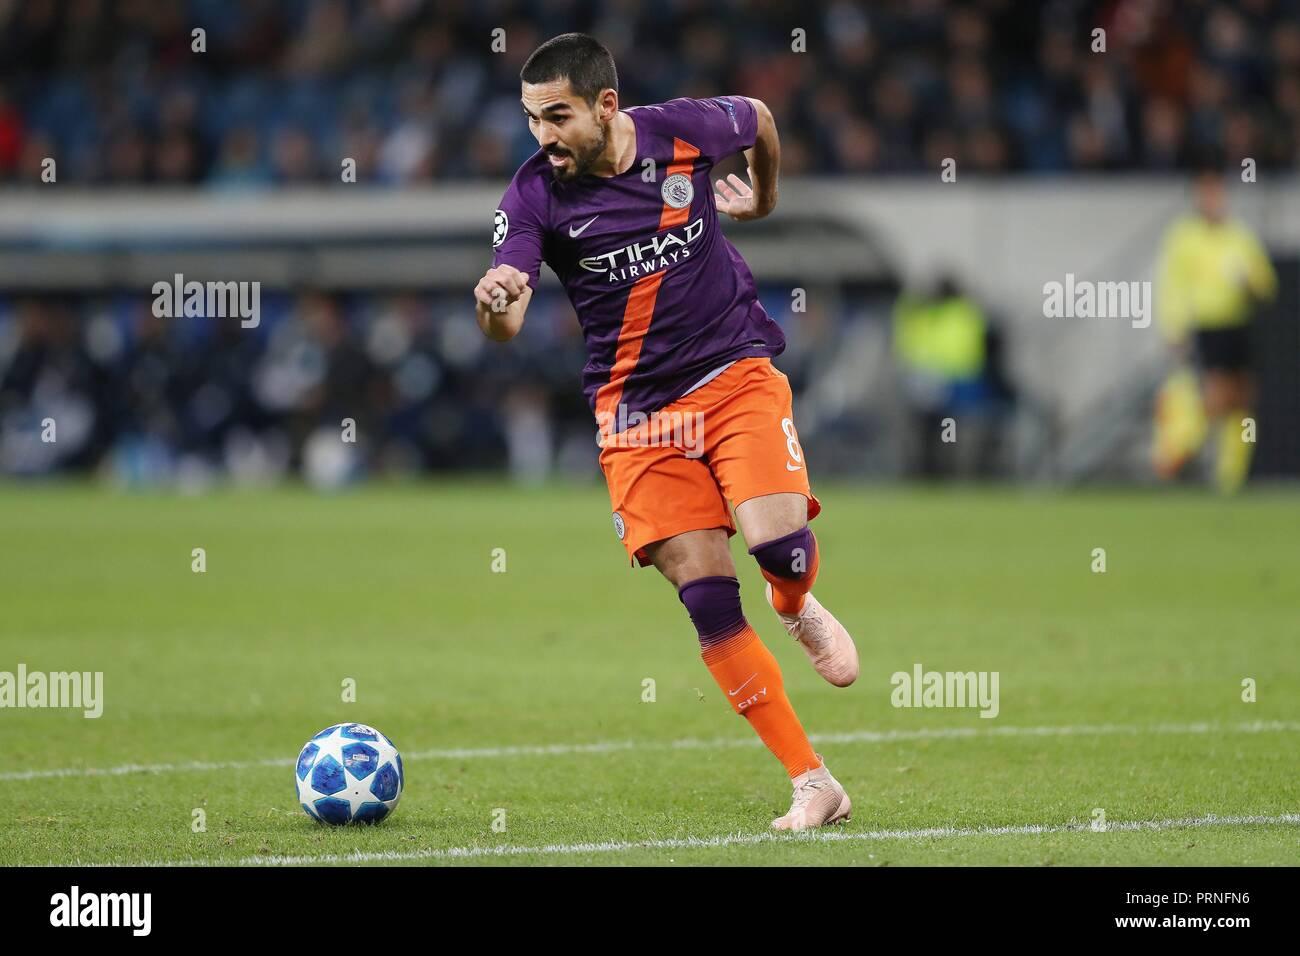 firo: 02.10.2018 Football, Football, Champions League: TSG Hoffenheim - Manchester City 1: 2 Ilkay Gundogan, single action,   usage worldwide - Stock Image